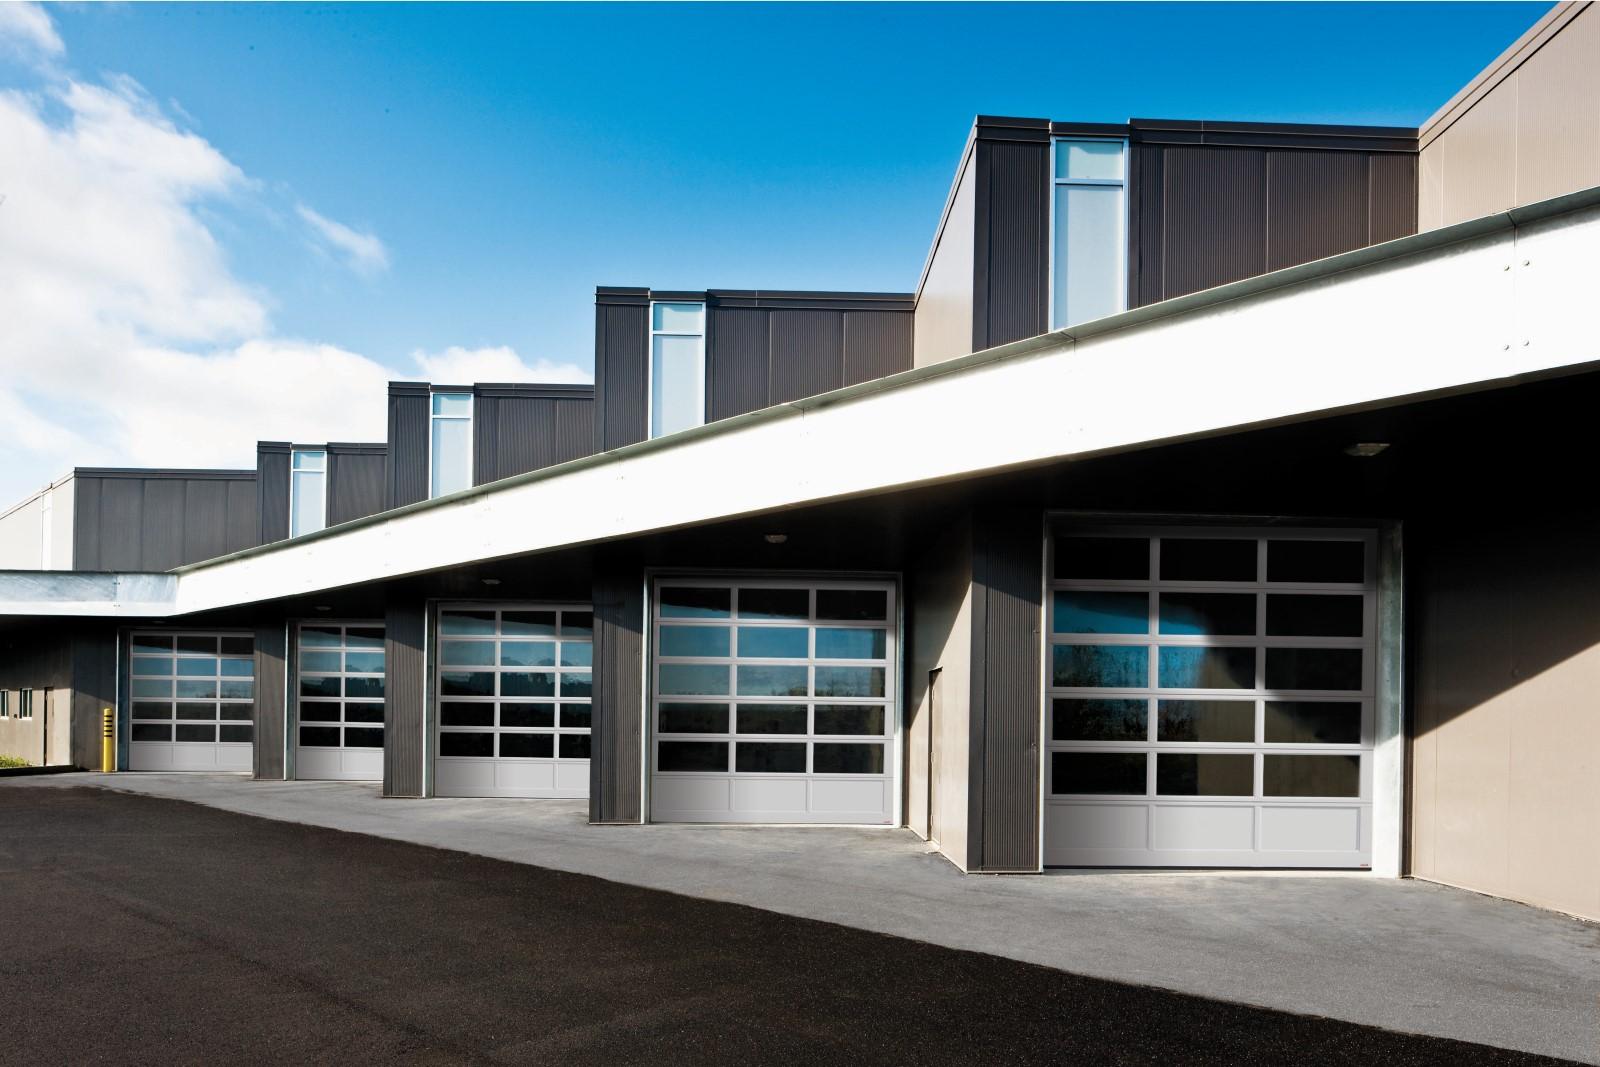 B Pritchard Amp Son Garage Door Installation And Service